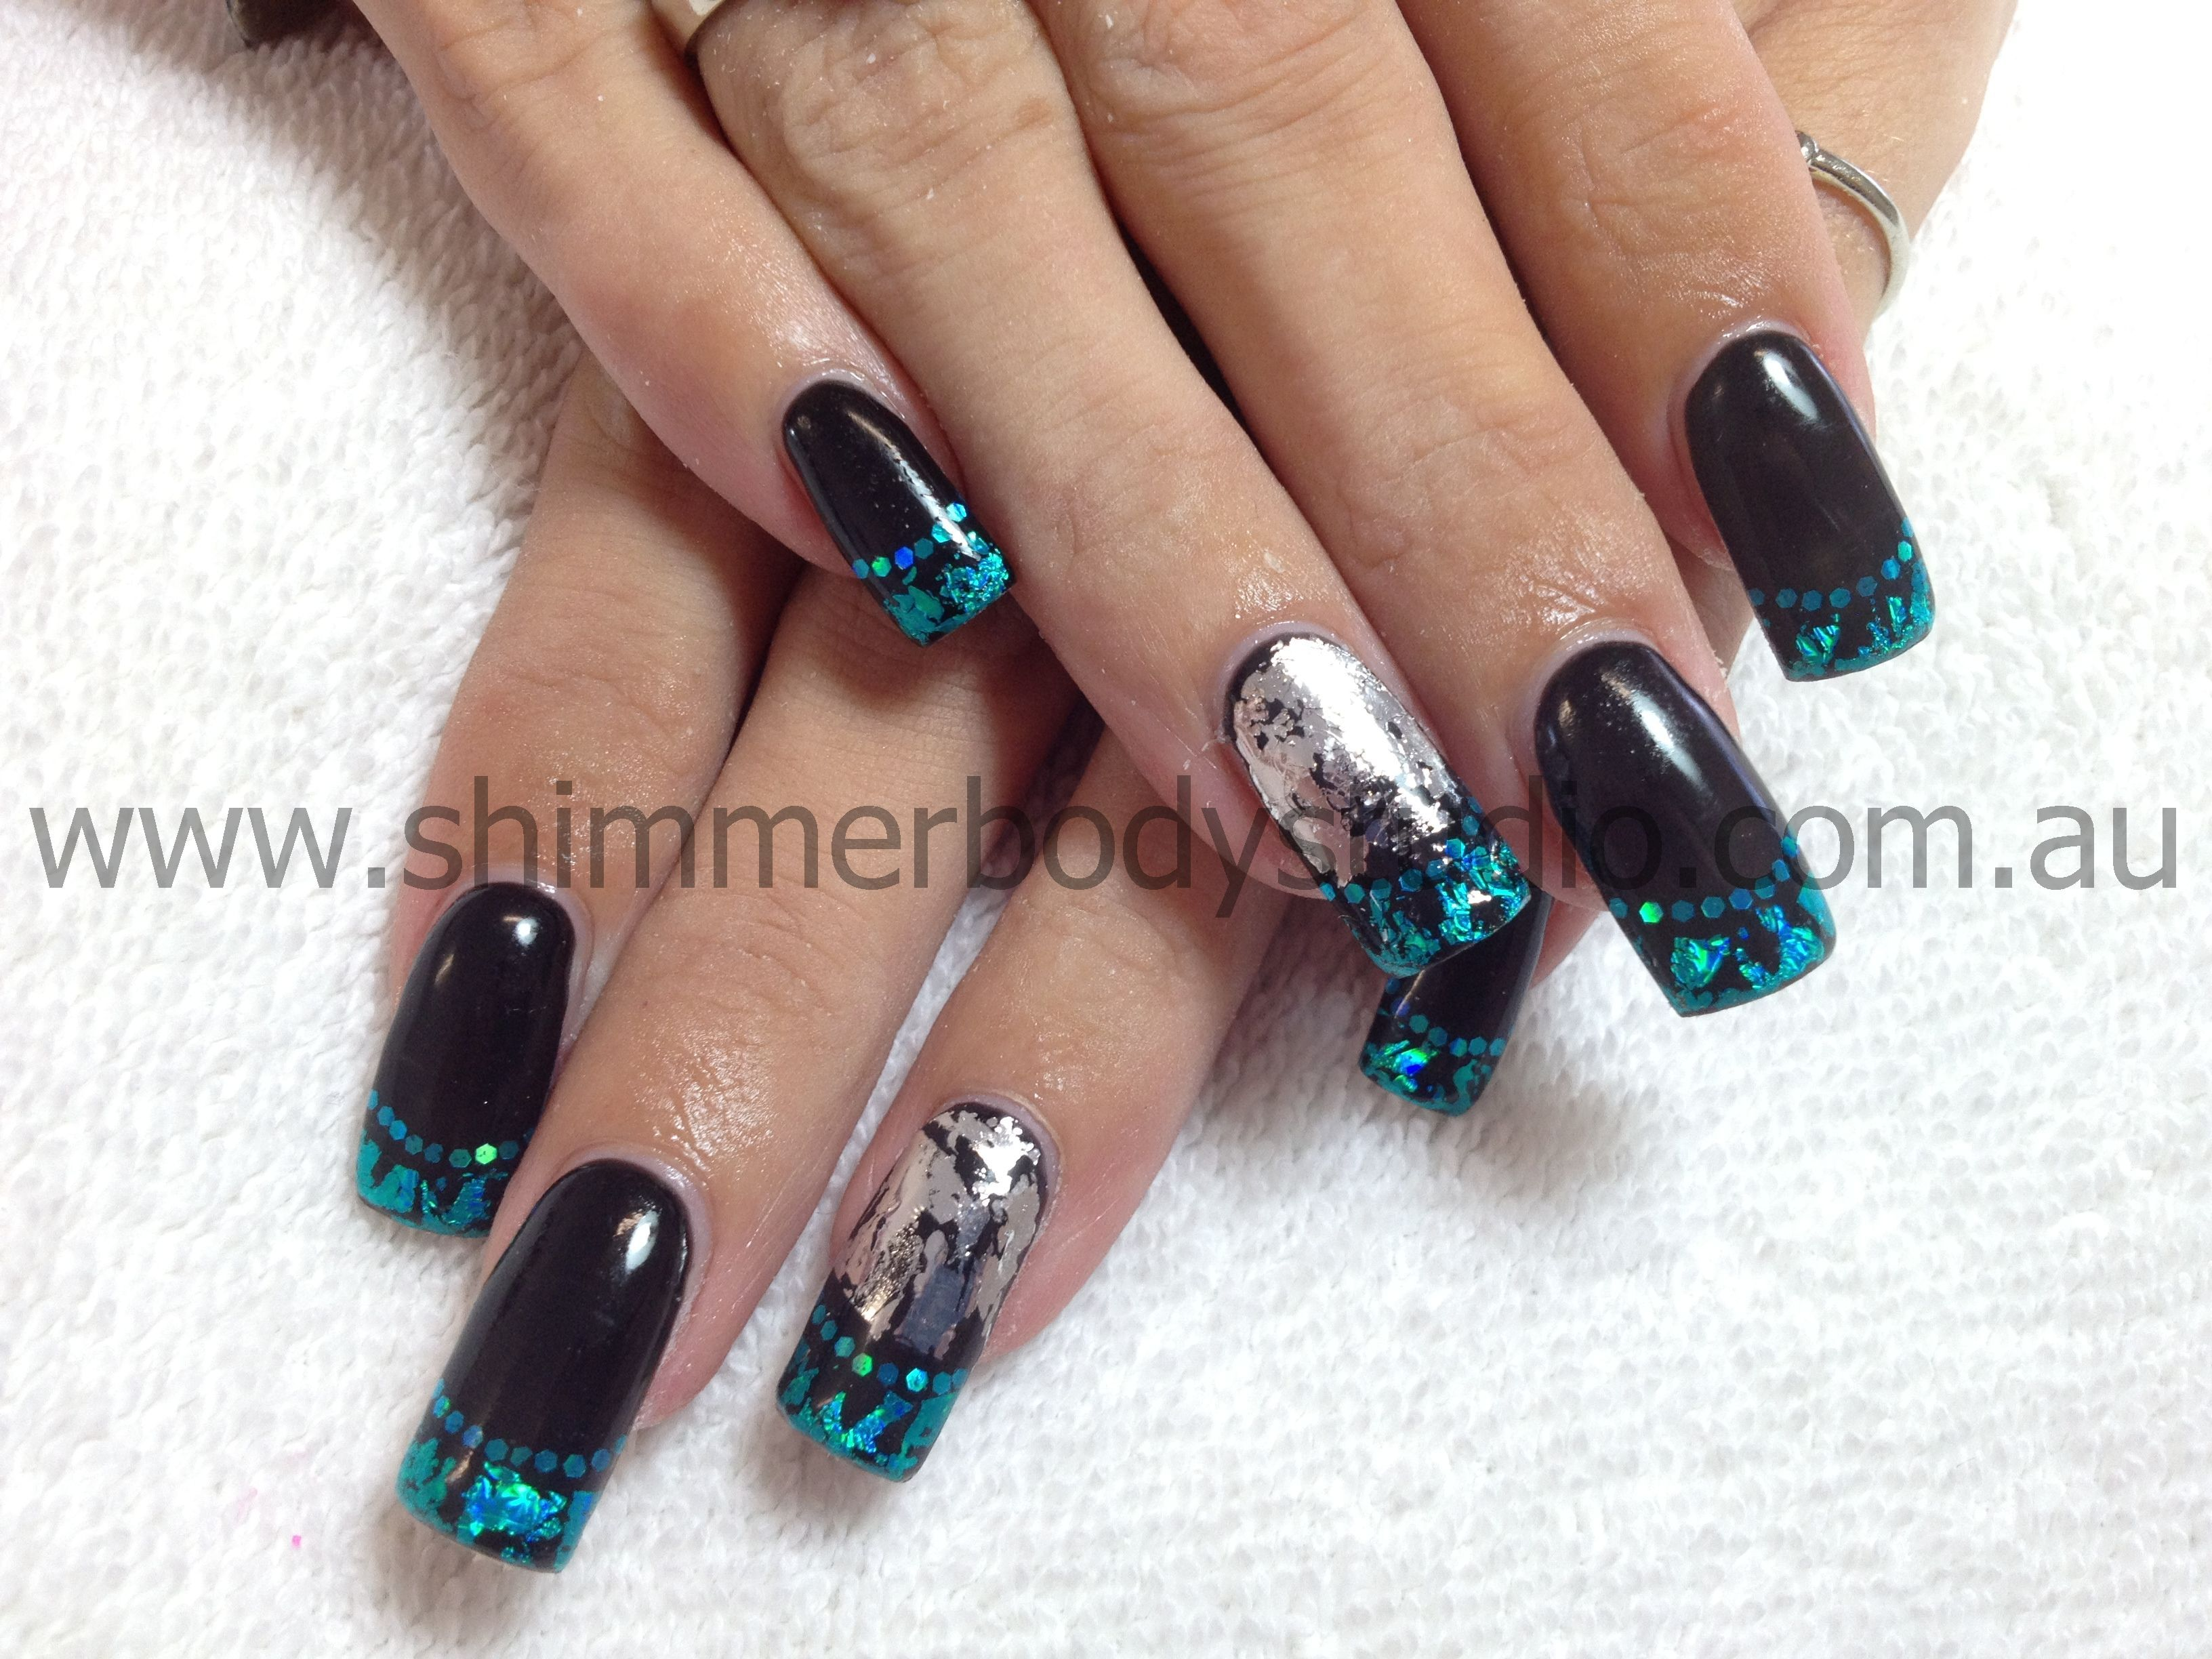 Gel nails black nails colour nails foil nail art nails full colour pinterest foil - Foil nail art ...